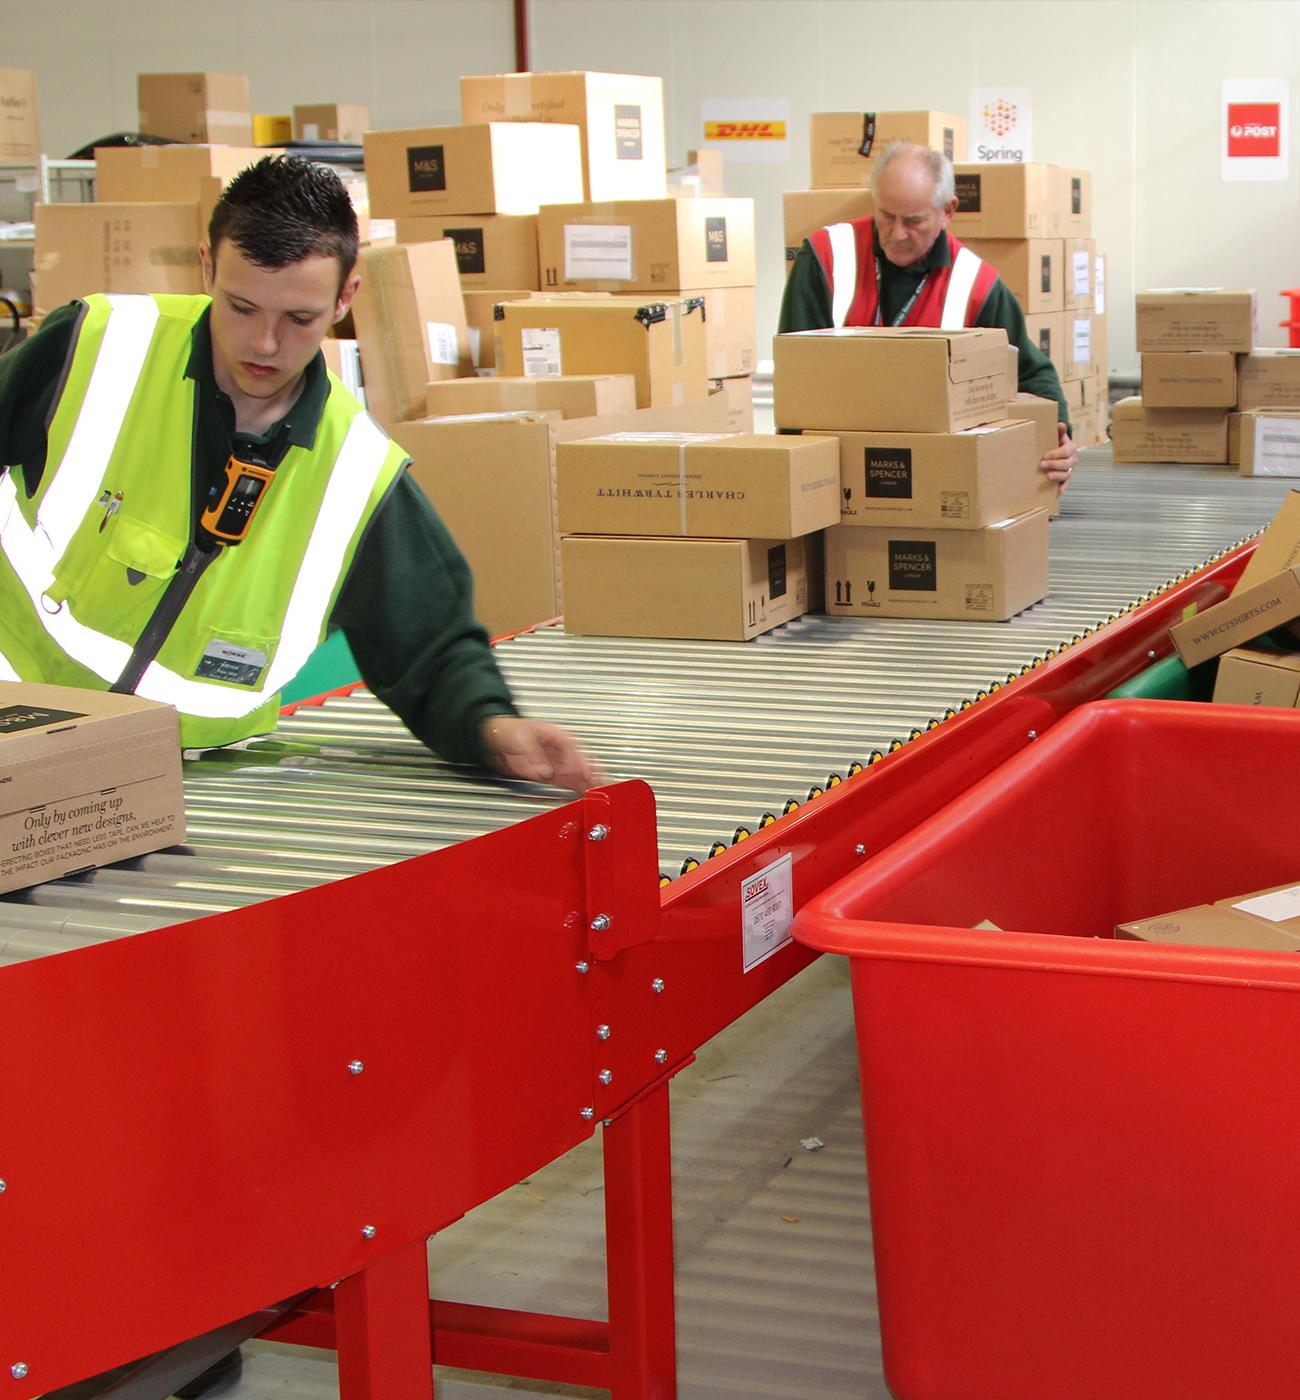 Warehousing - Norsk Global - Delivering the World